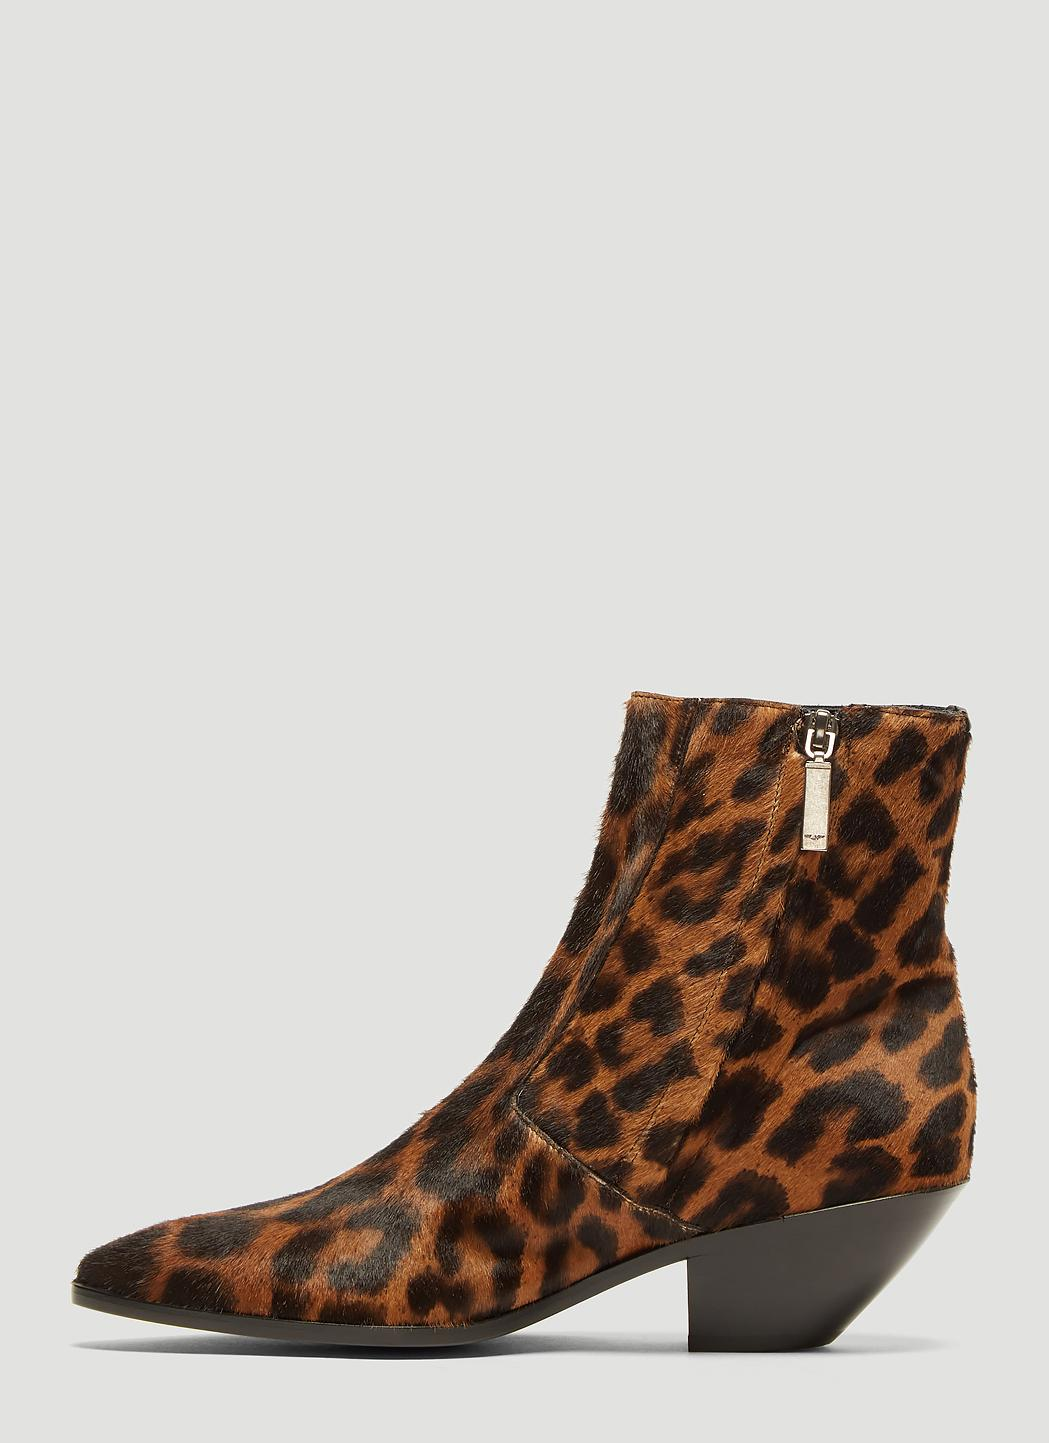 8adac4814 saint-laurent-leopard-West-Leopard-print-Calf-hair-Boots-In-Brown.jpeg